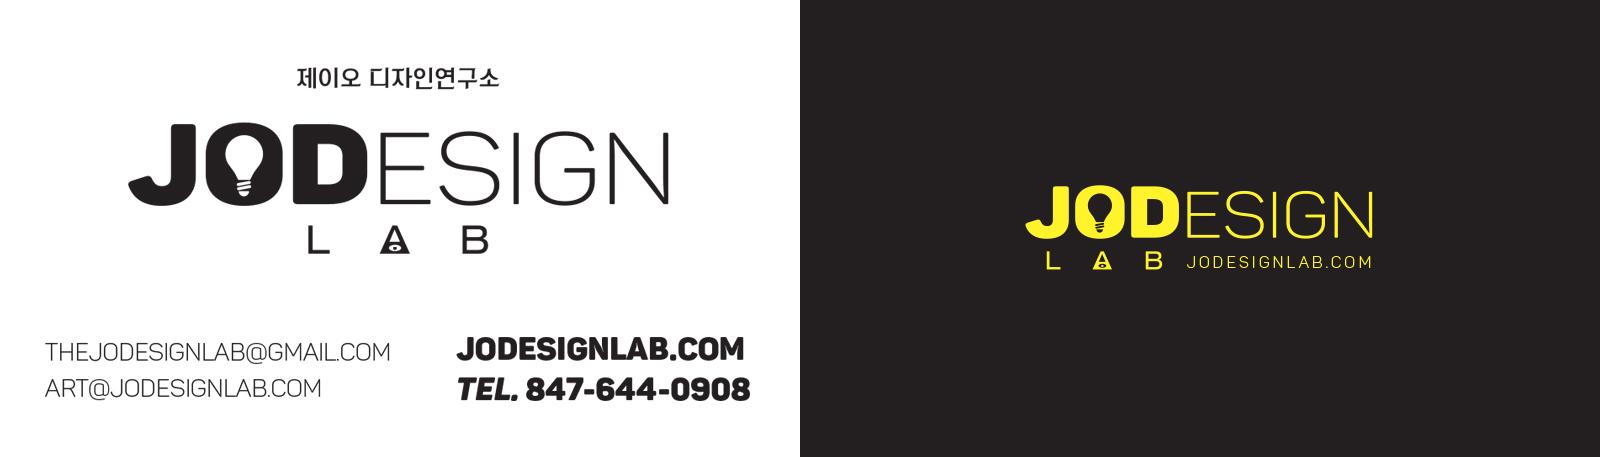 JODesign lab 안녕하세요 디자인 하는 김정오 입니다.